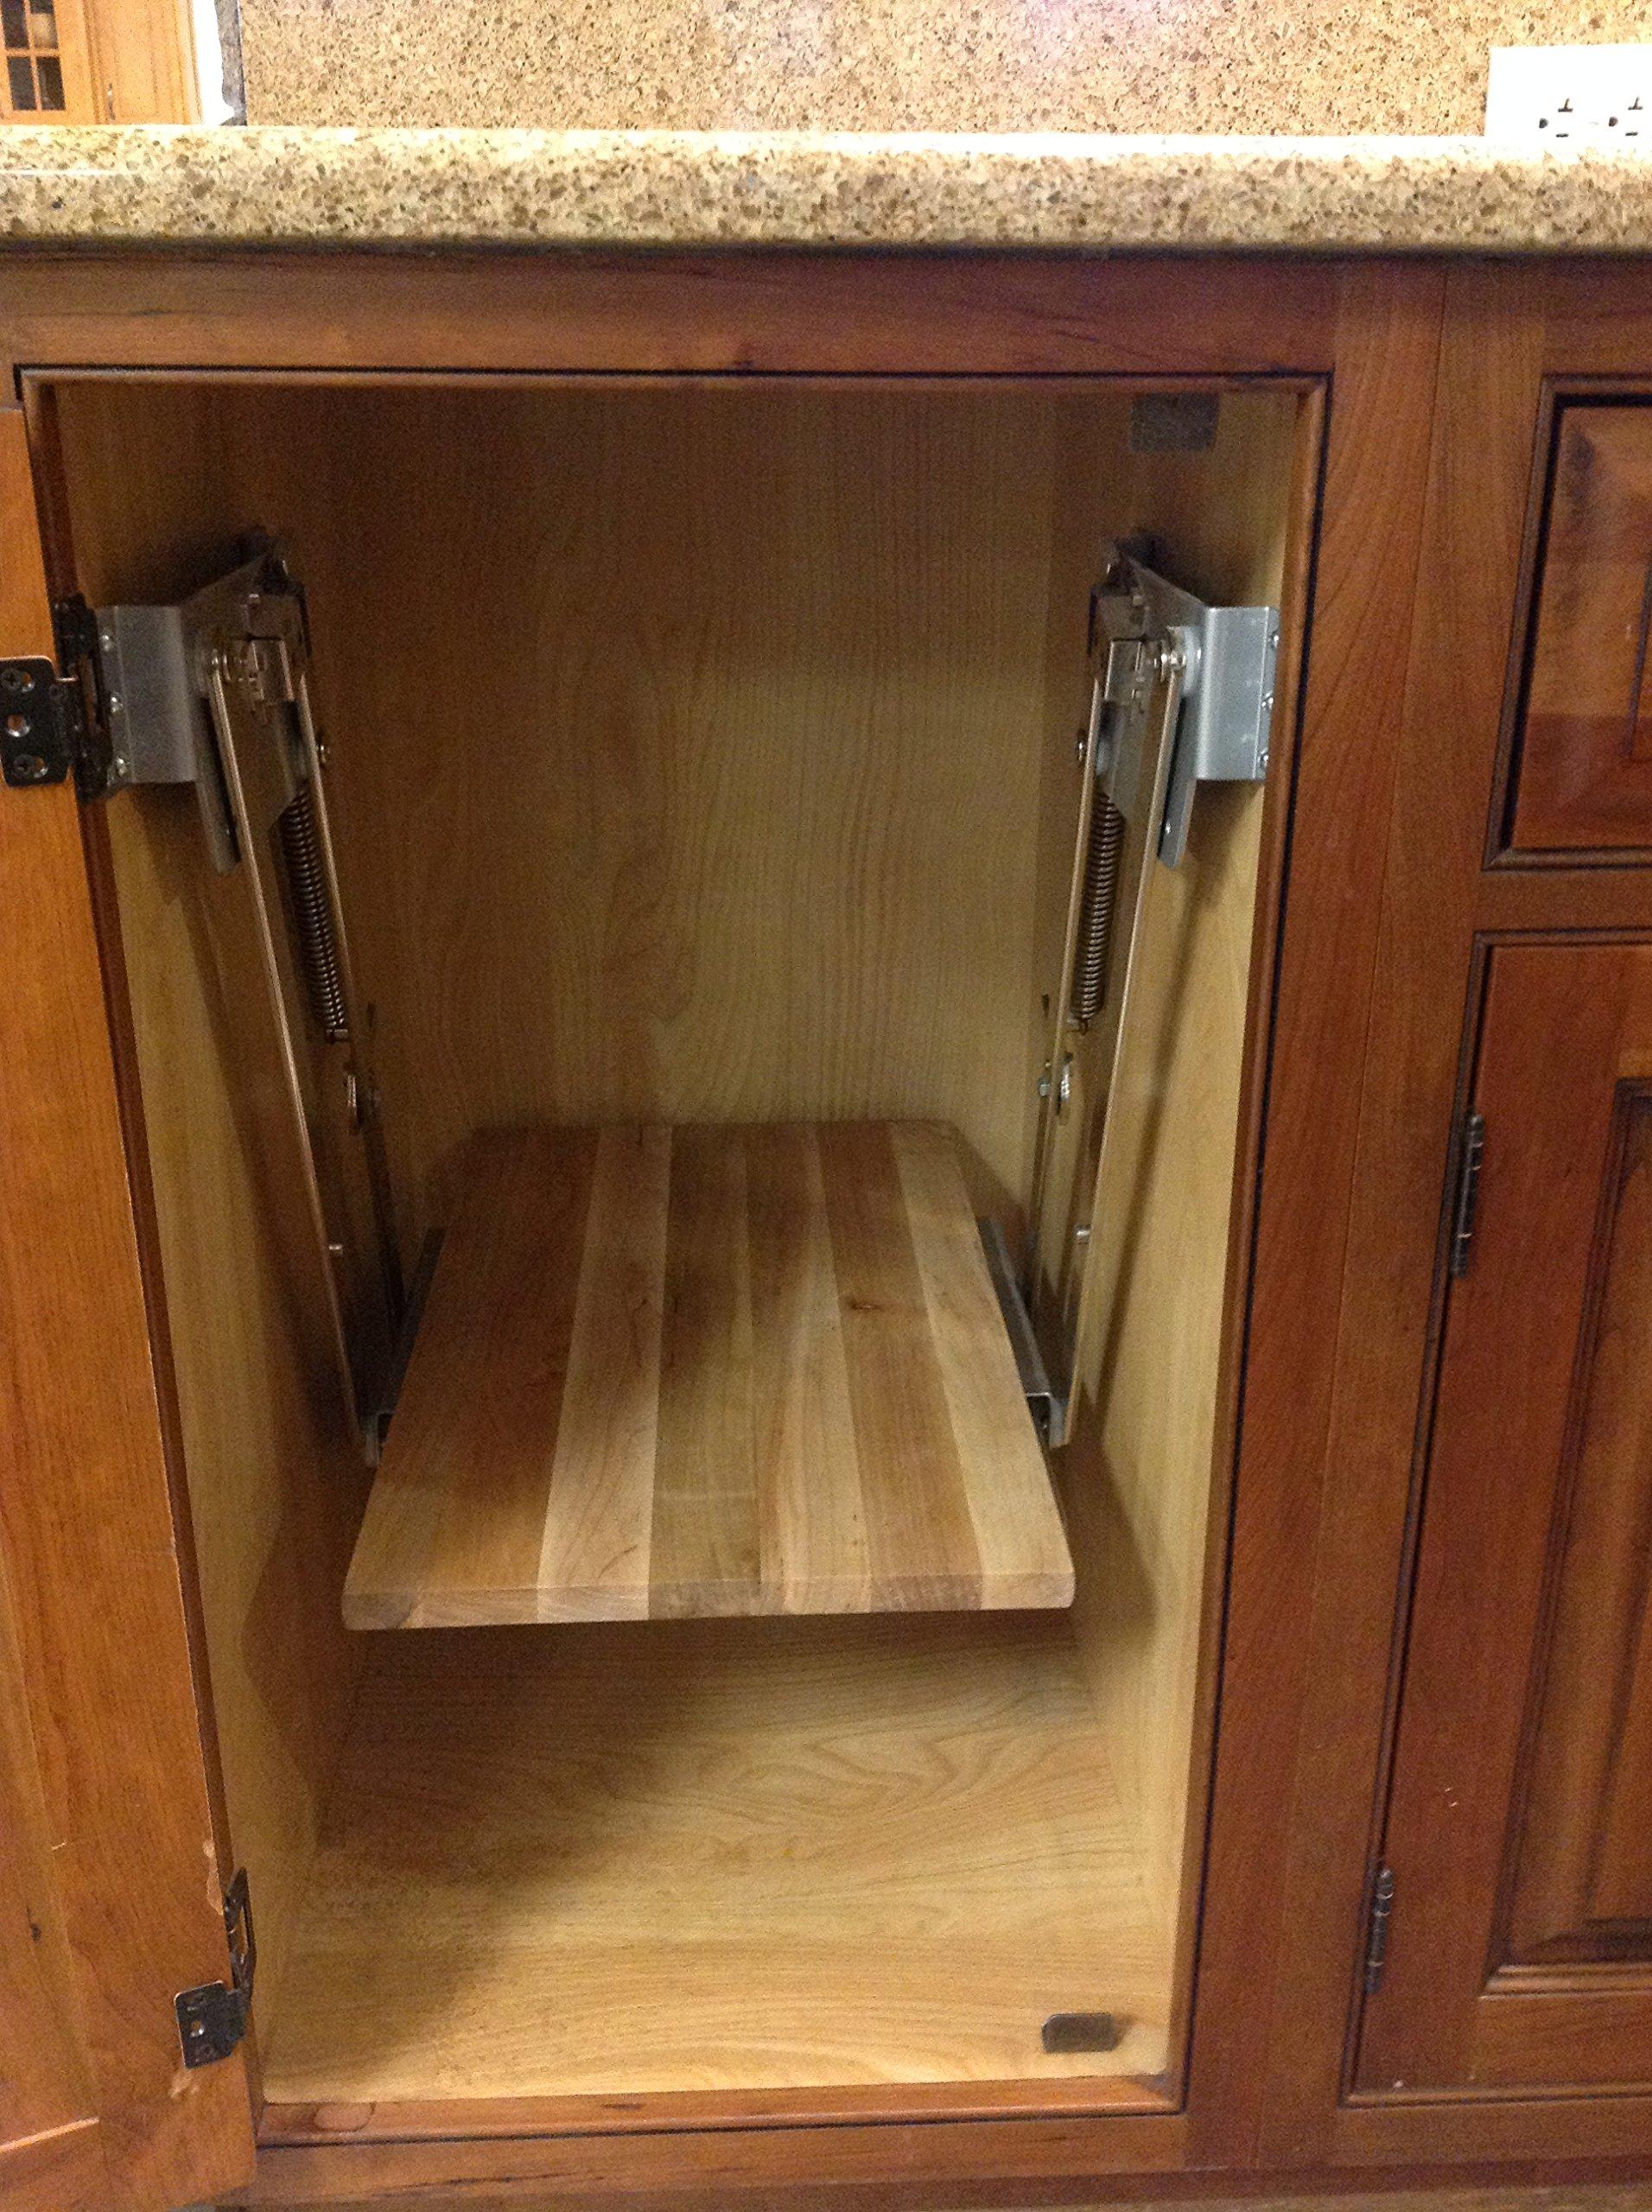 Wood Shelf Platform ONLY - 3/4'' x 12'' x 19'' - For Revashelf RAS-ML-HDCR Heavy Duty Mixer Lift - Maple Butcher Block - Trimmable by HomeProShops (Image #4)